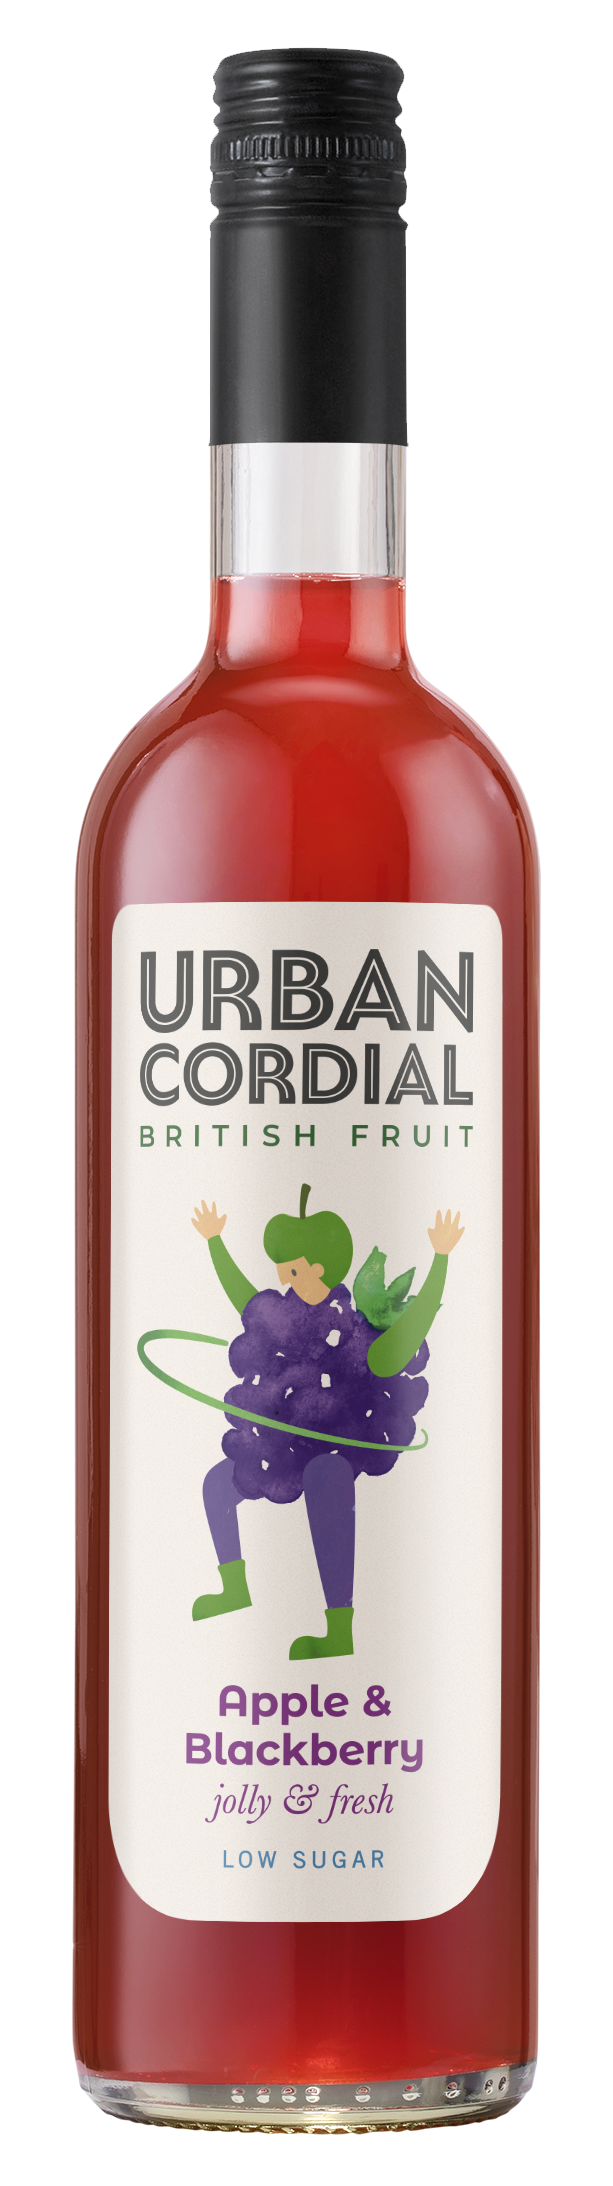 Apple & Blackberry Cordial by Urban Cordials 500ml